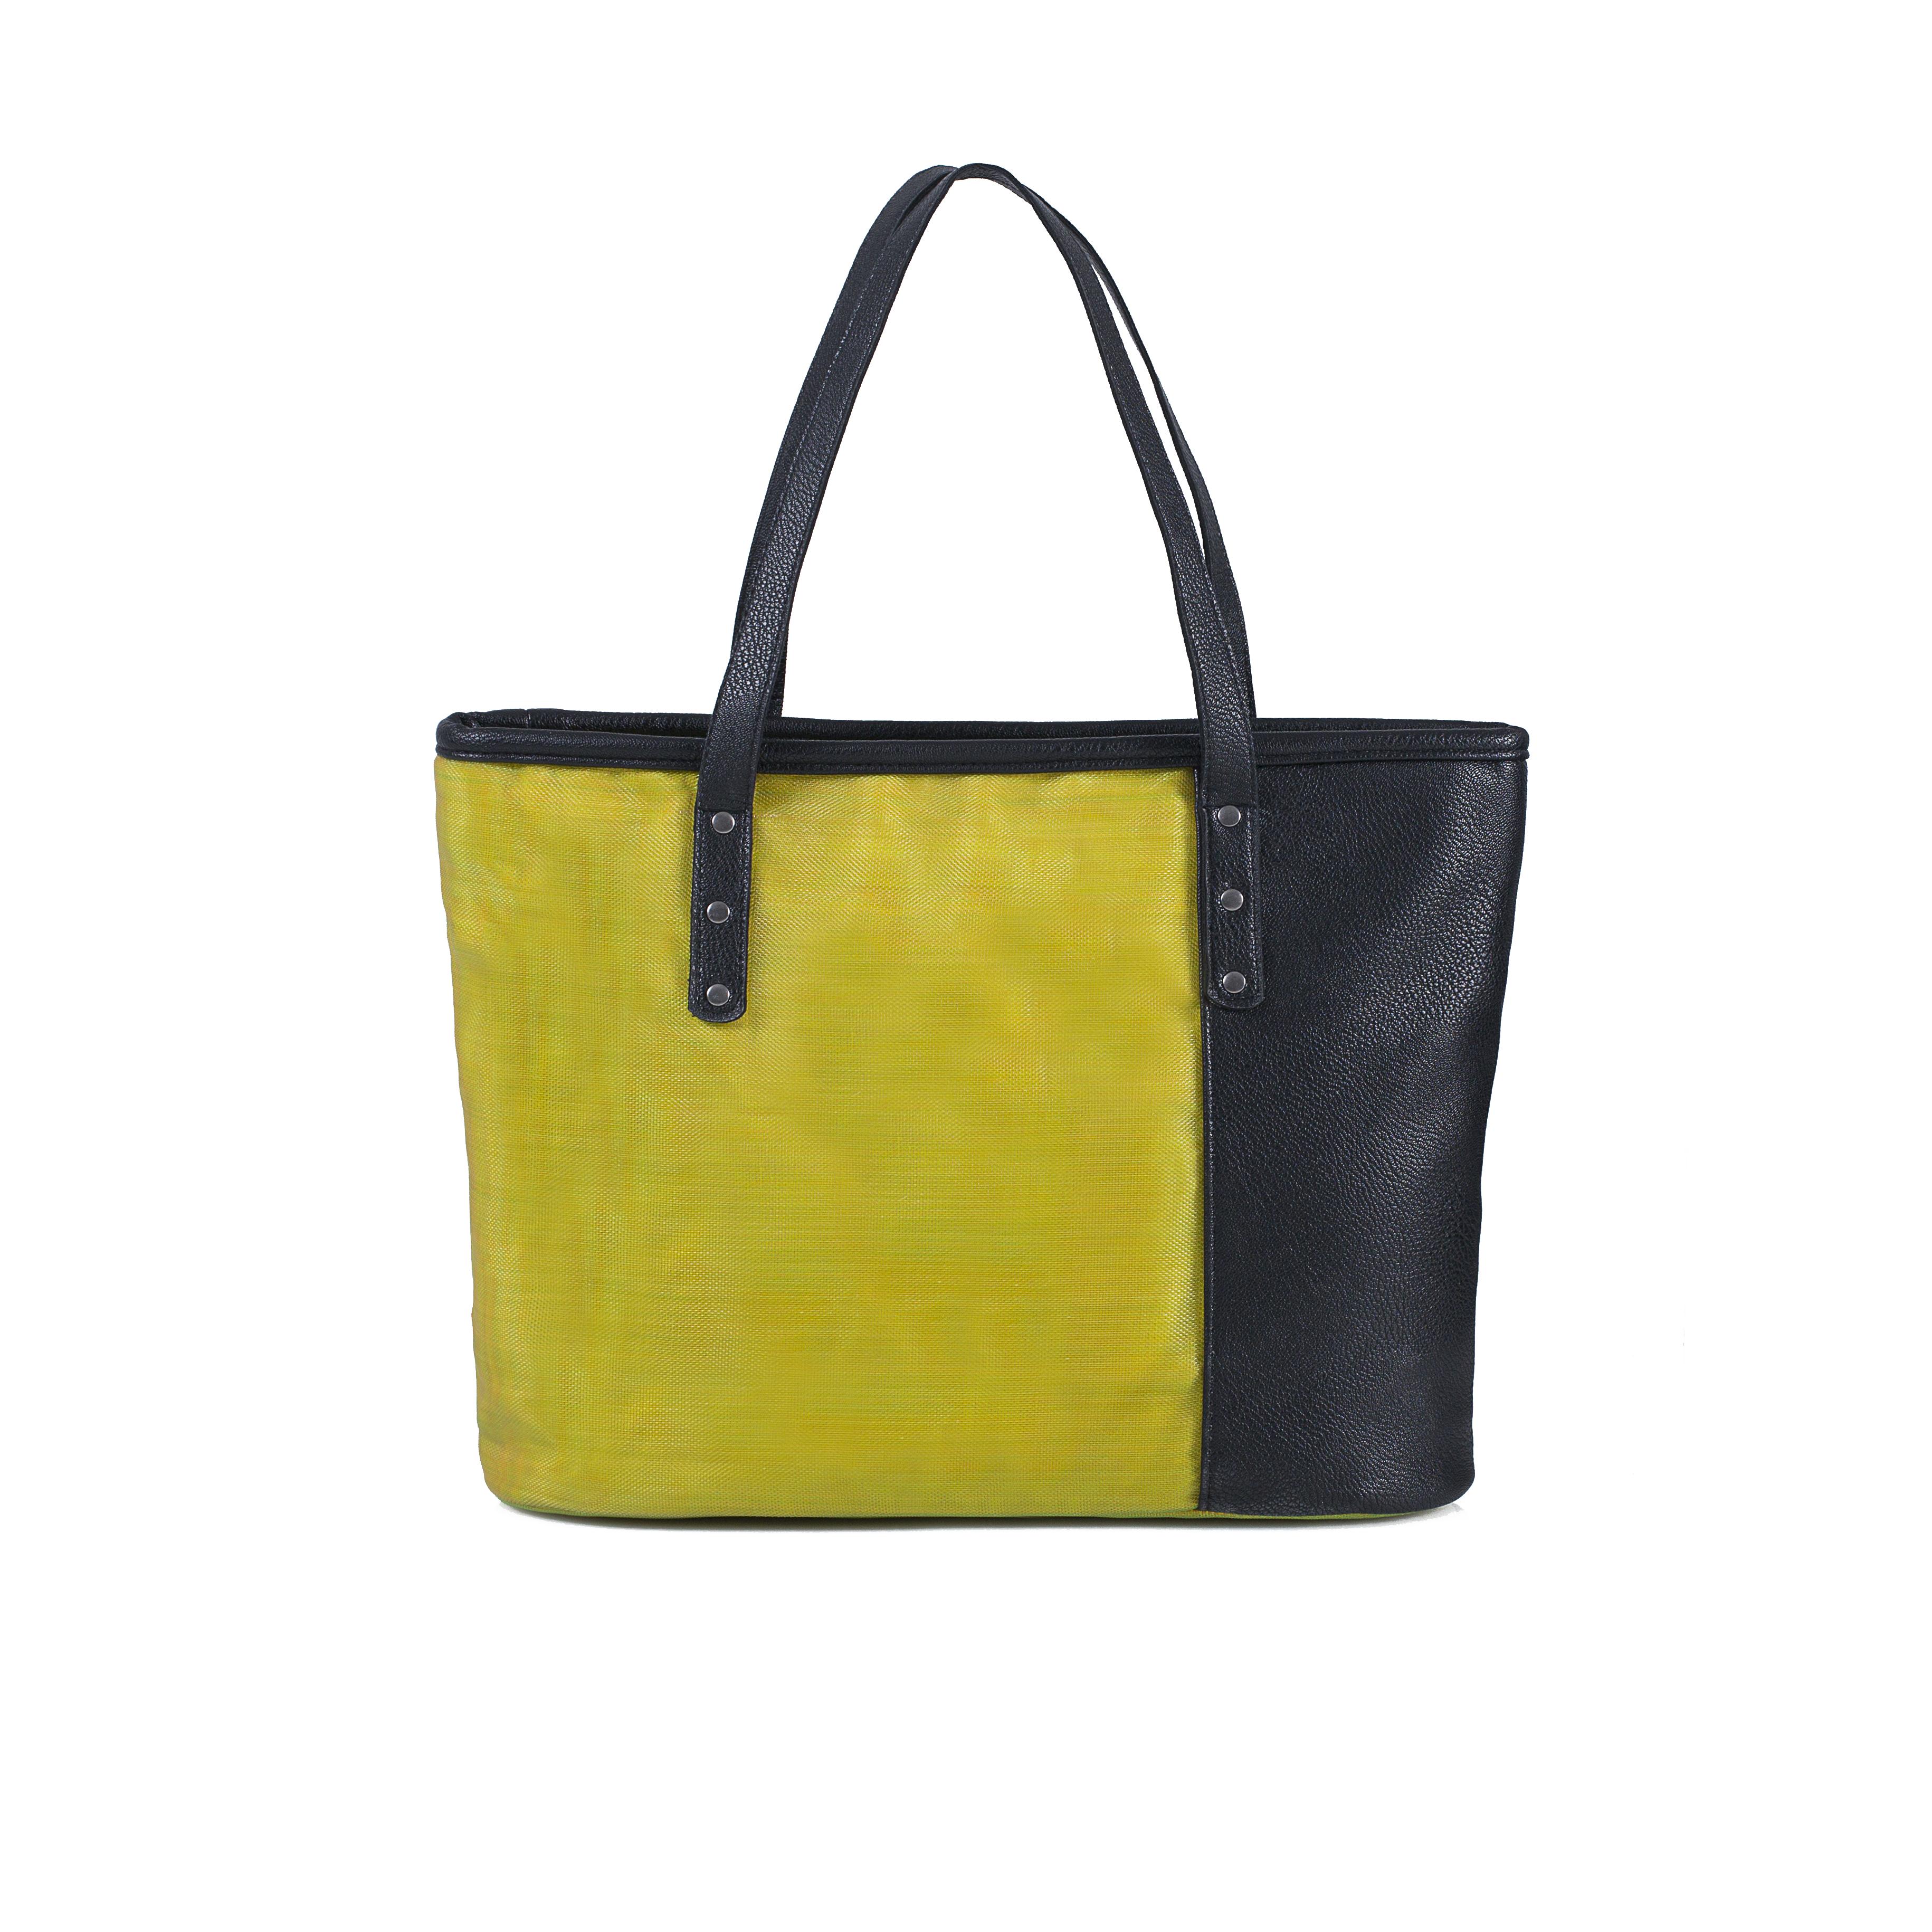 Darany - Ethical Handbag - Yellow